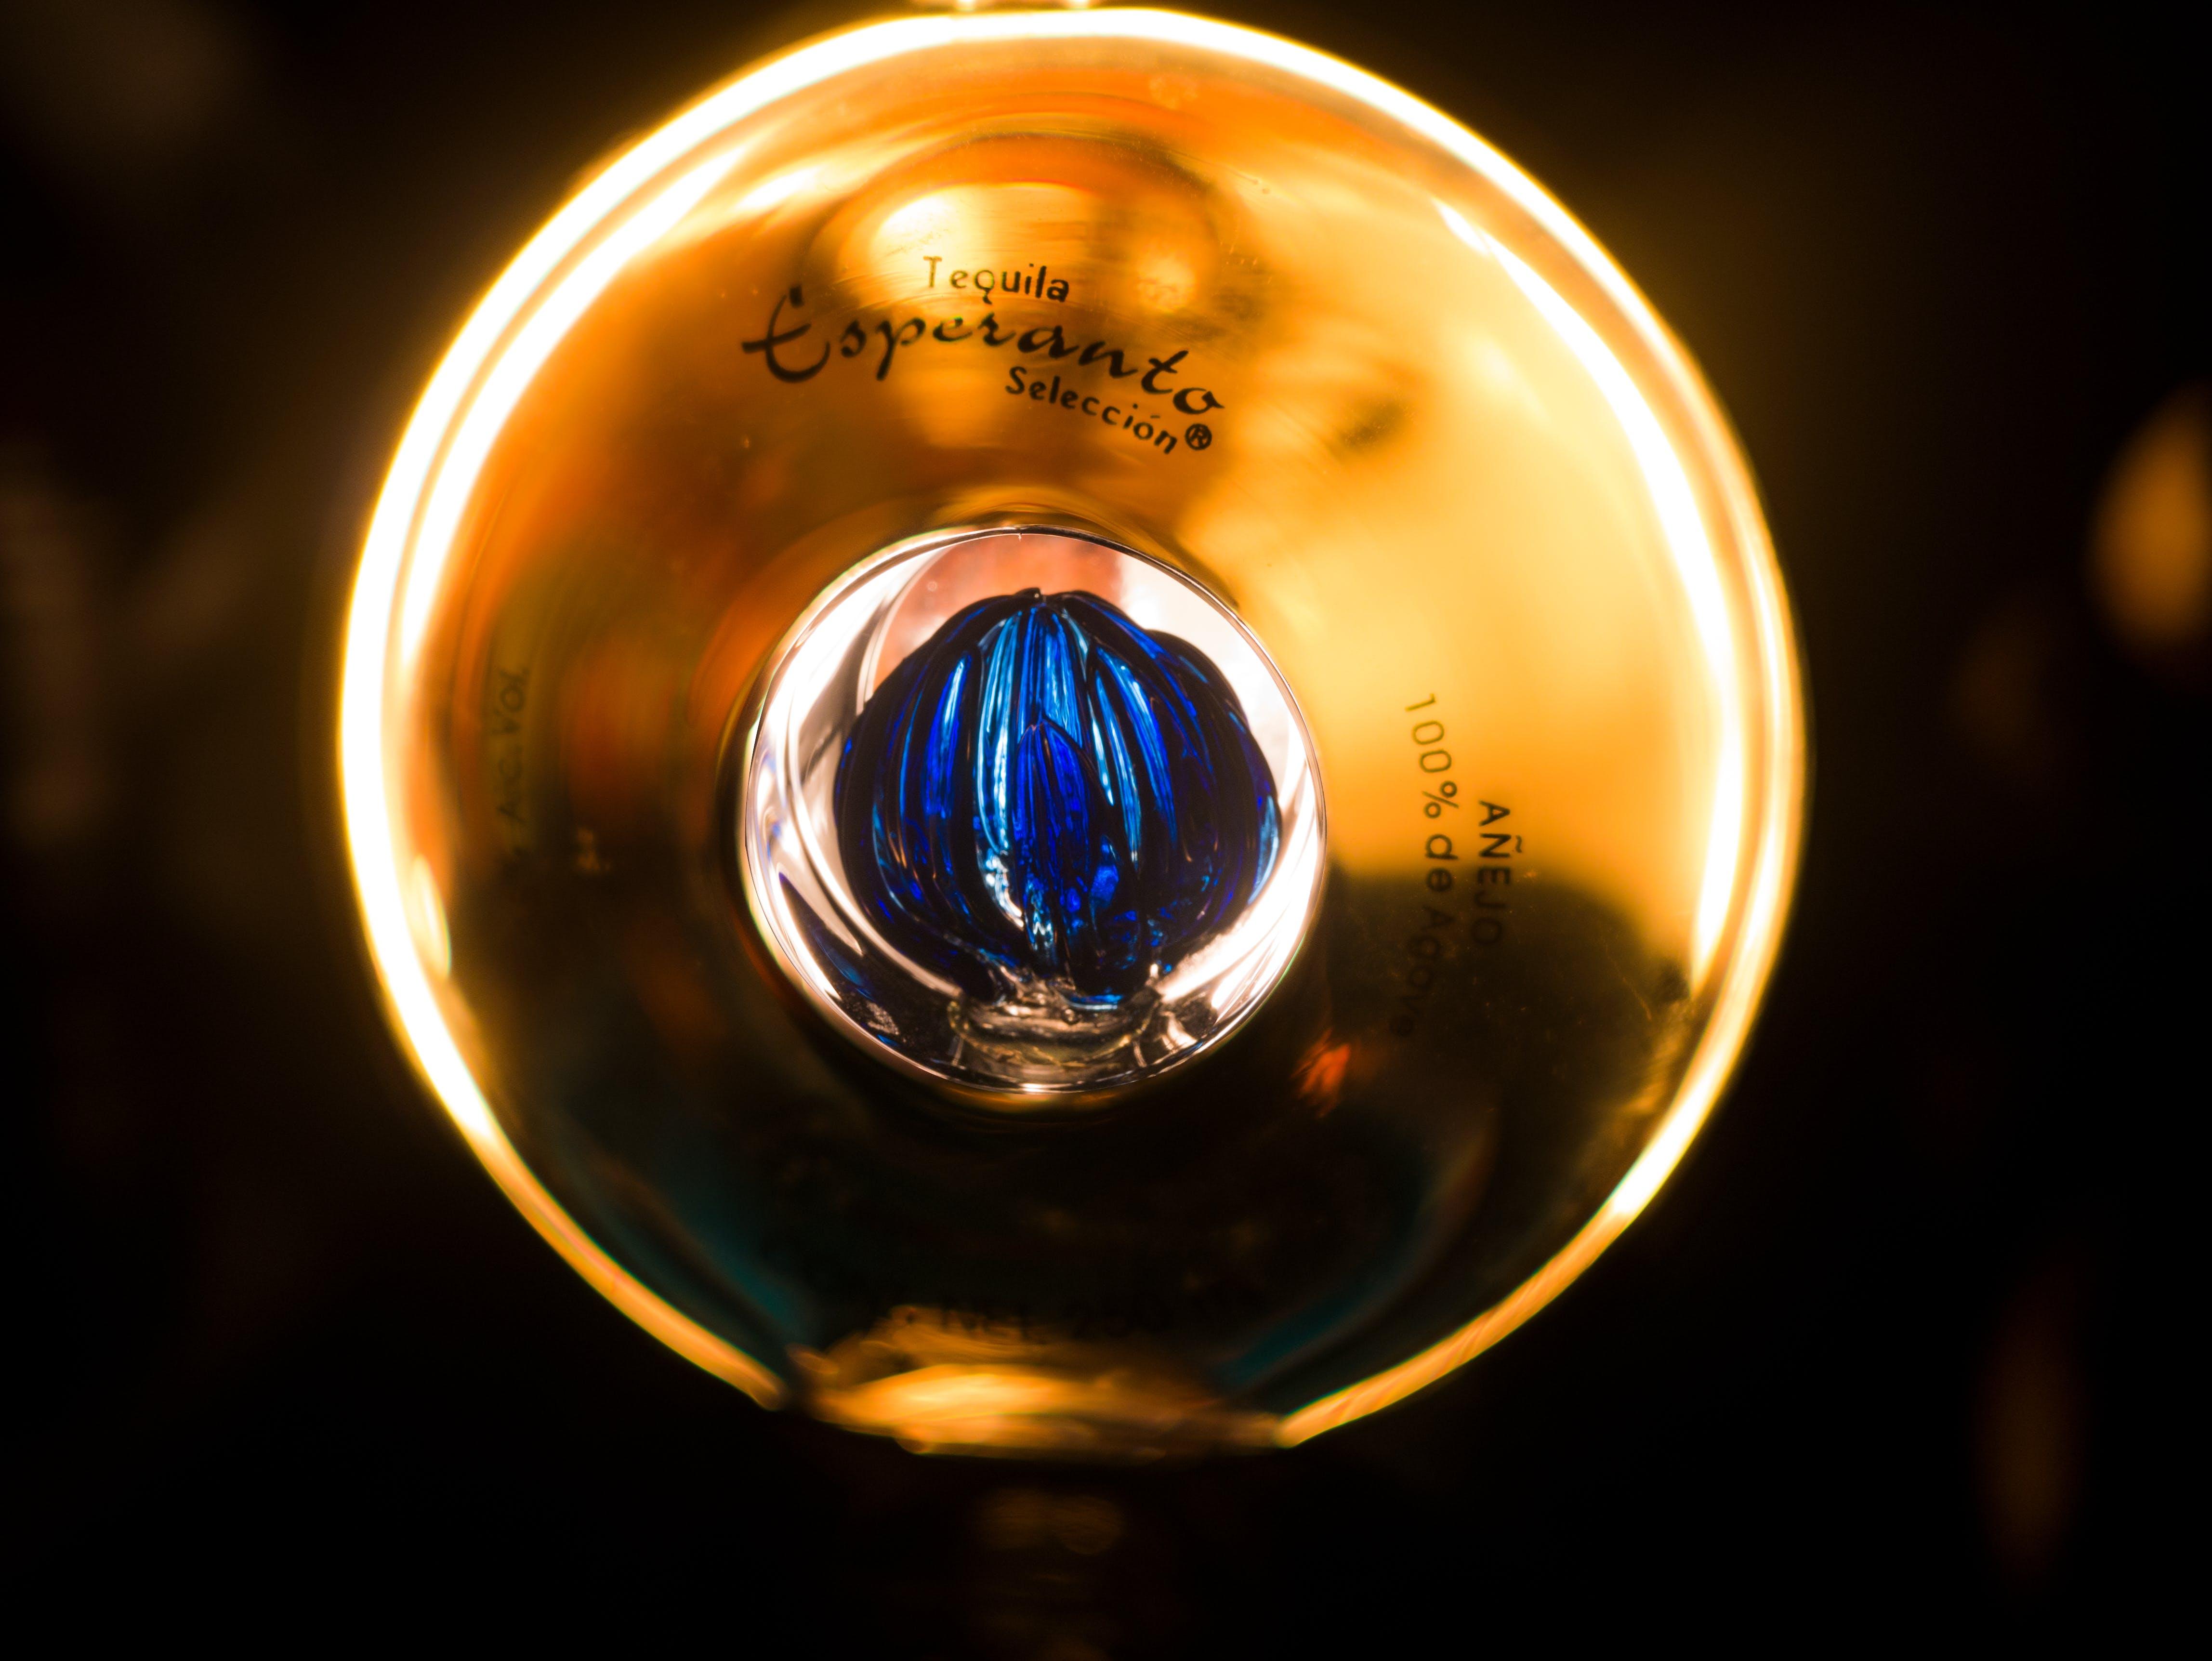 Free stock photo of light, blue, alcohol, yellow